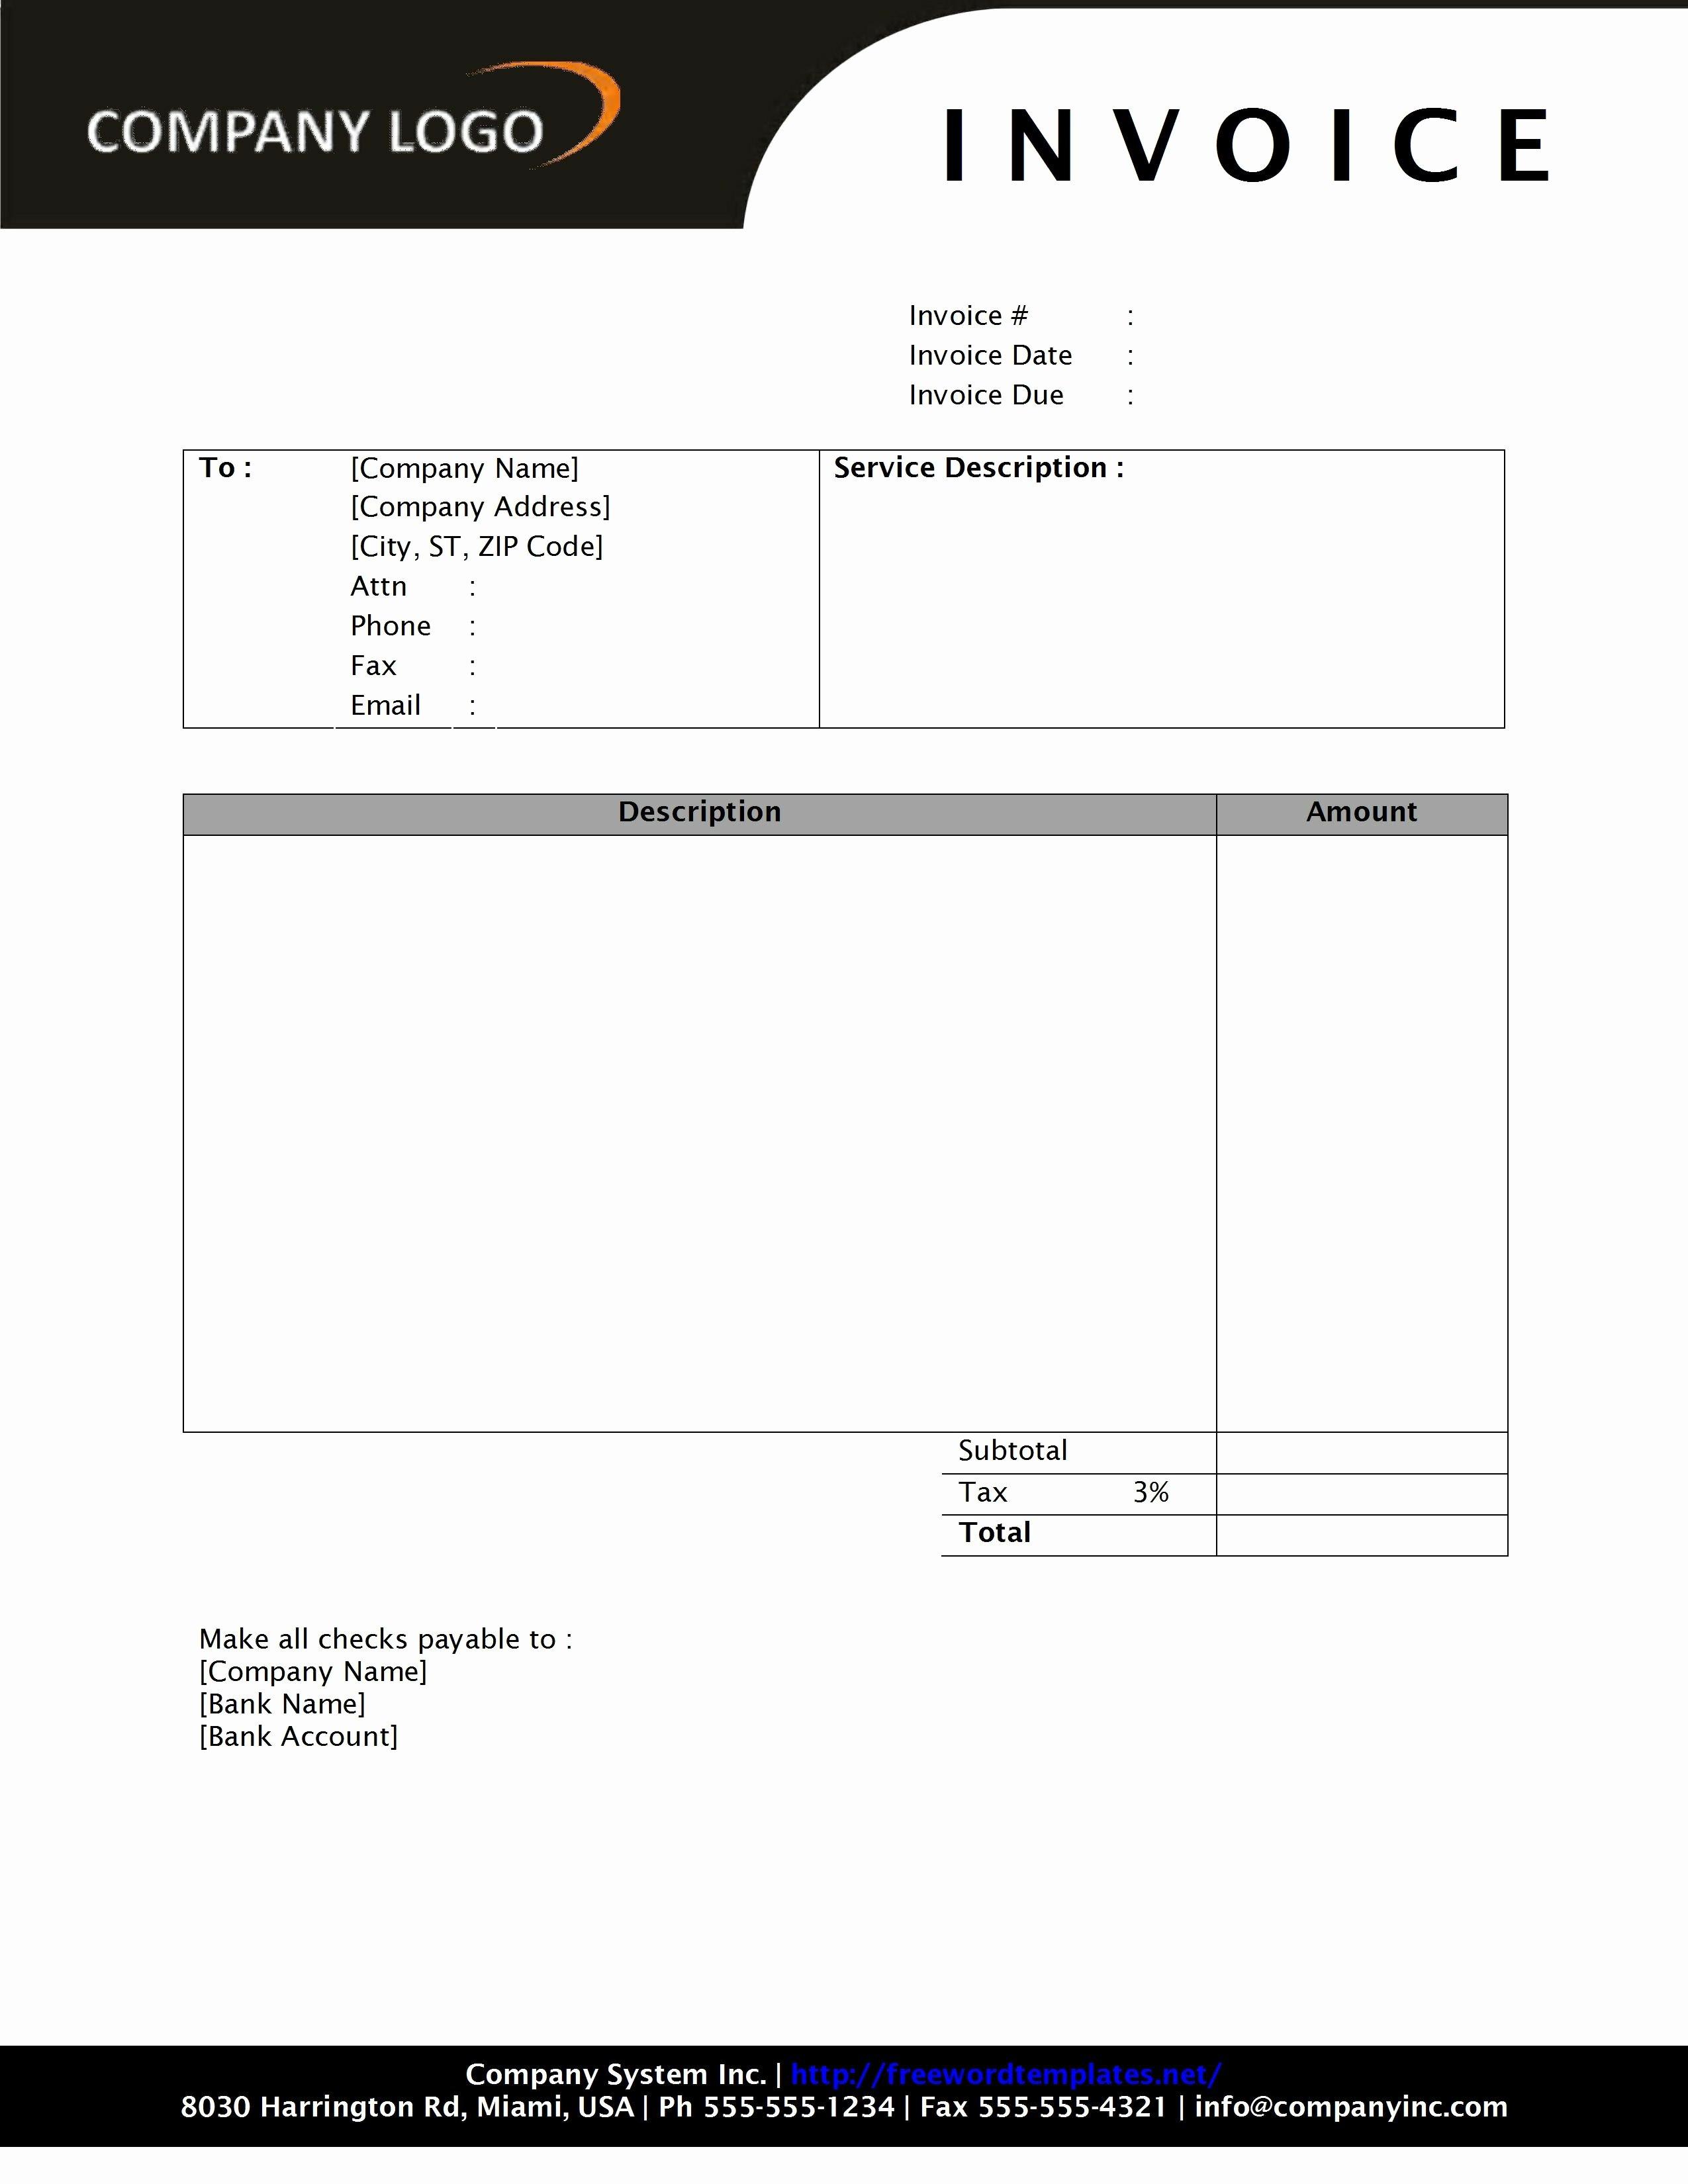 Free Sales Invoice Template Elegant Invoice Template Word 2010